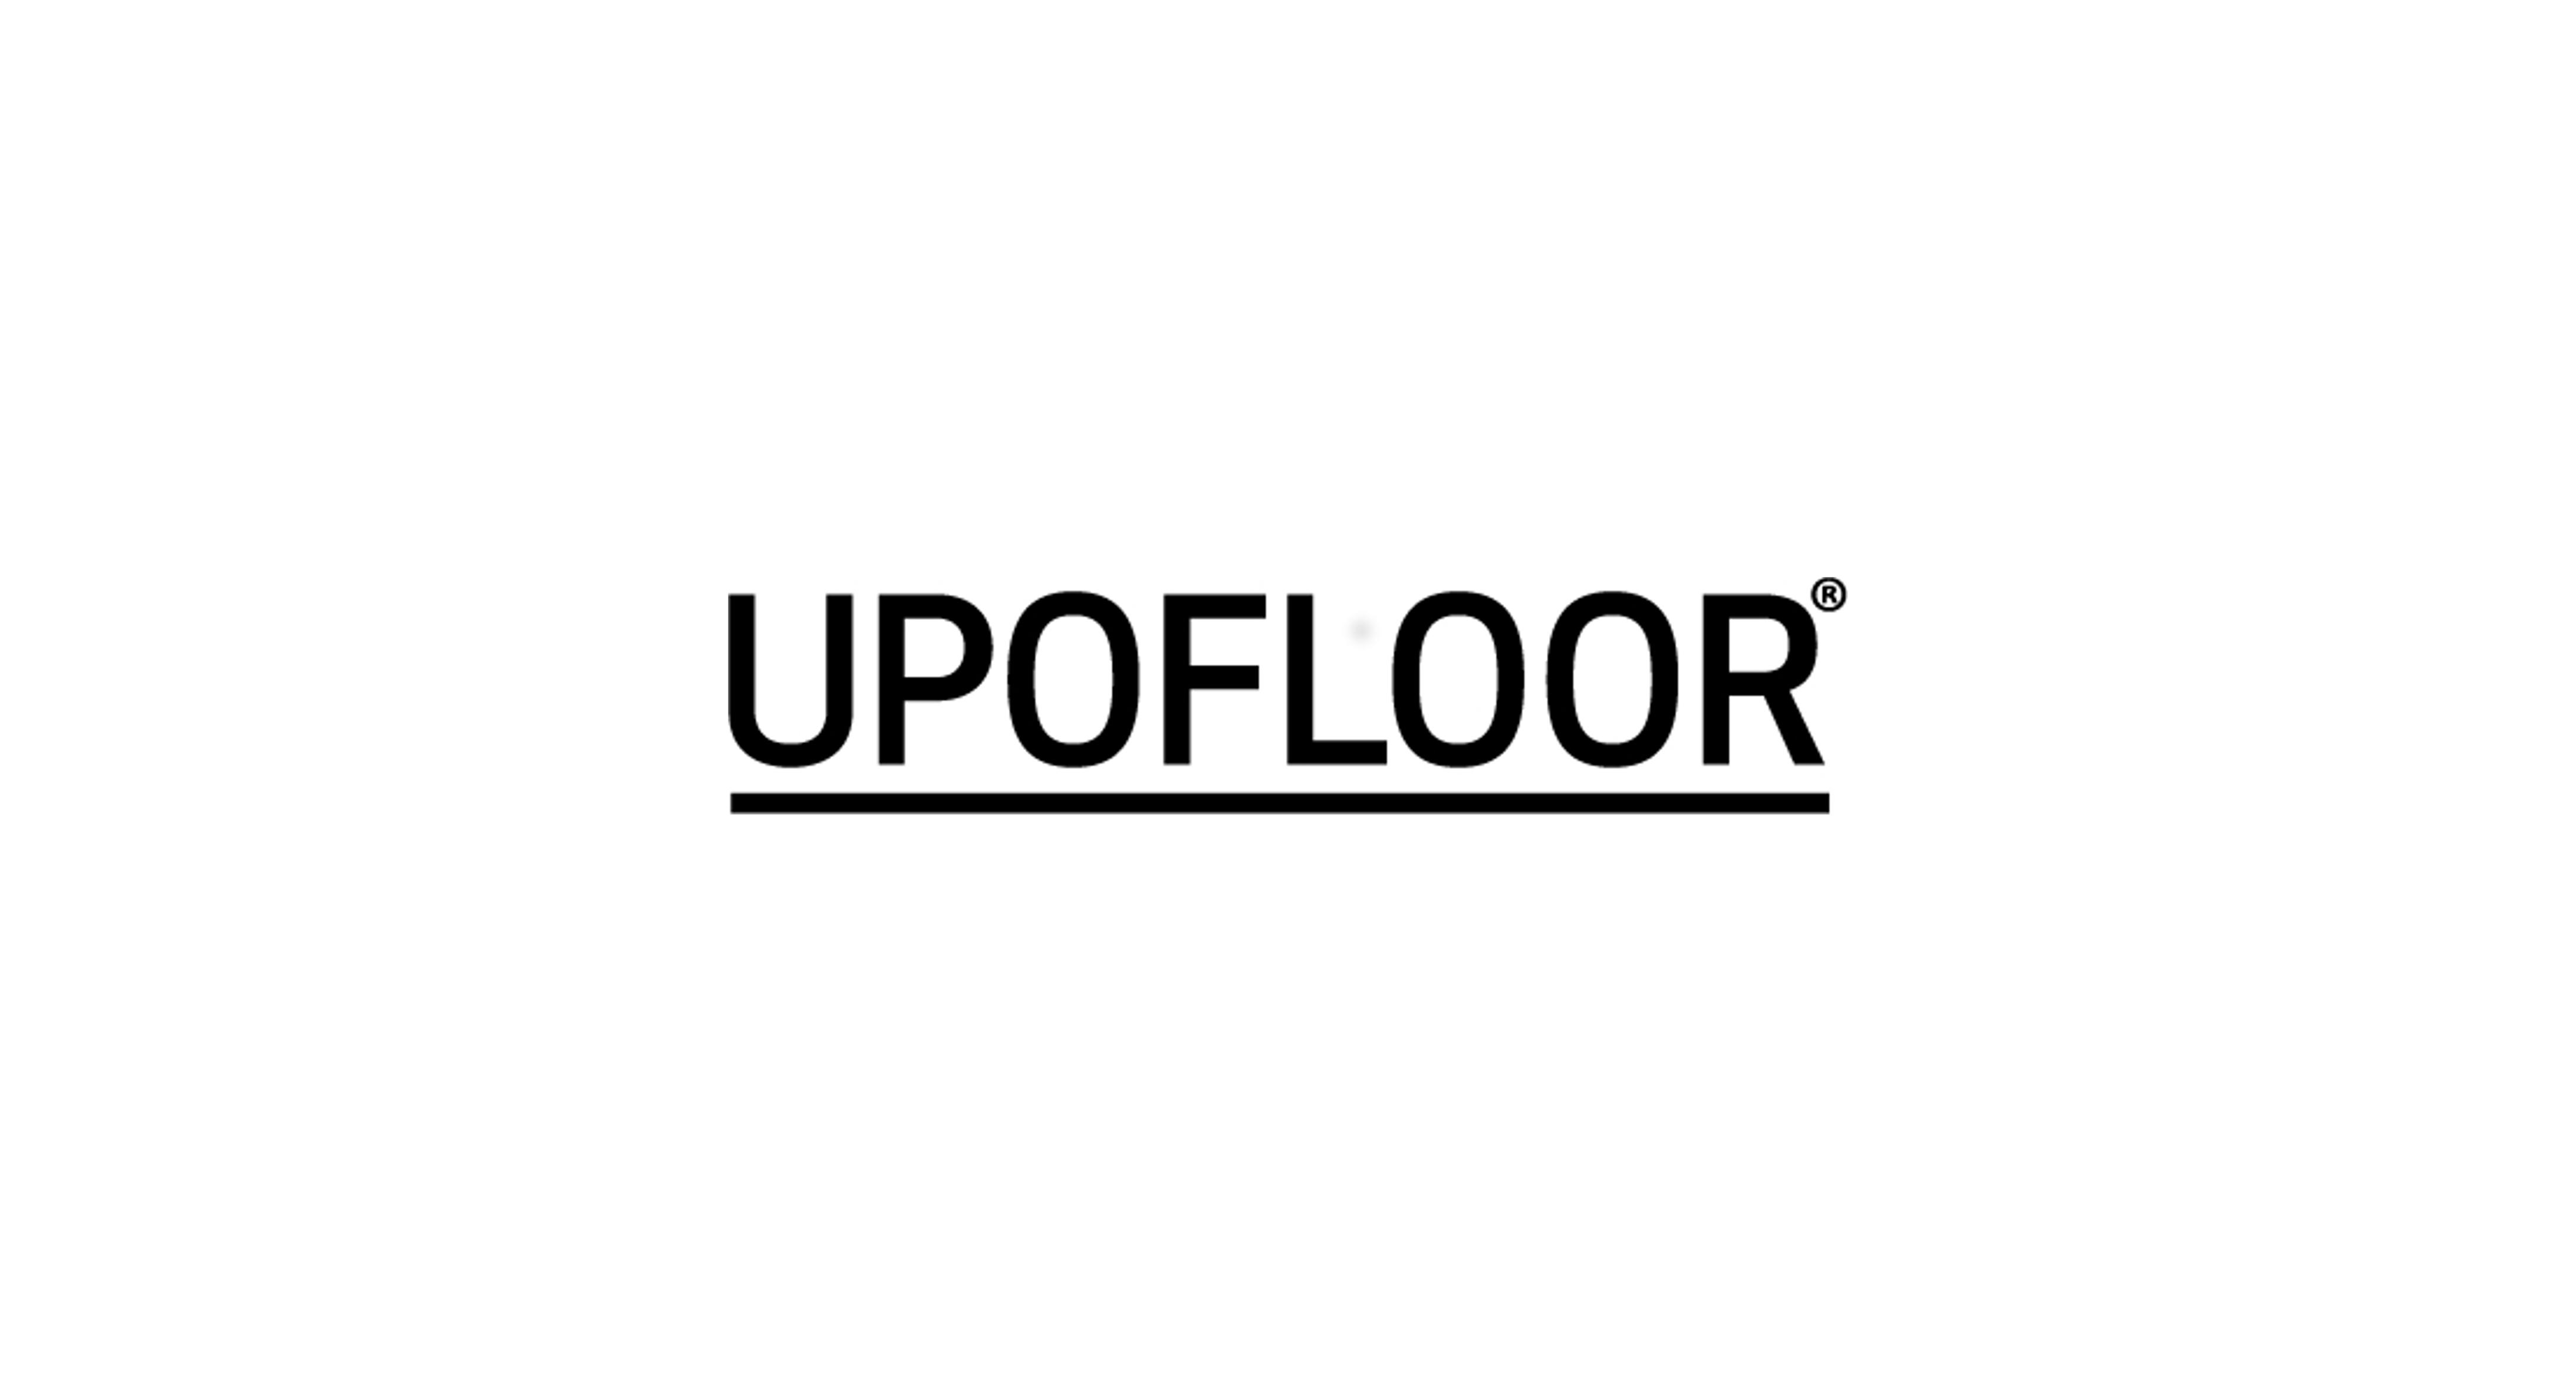 047_Upofloor_Logo_2